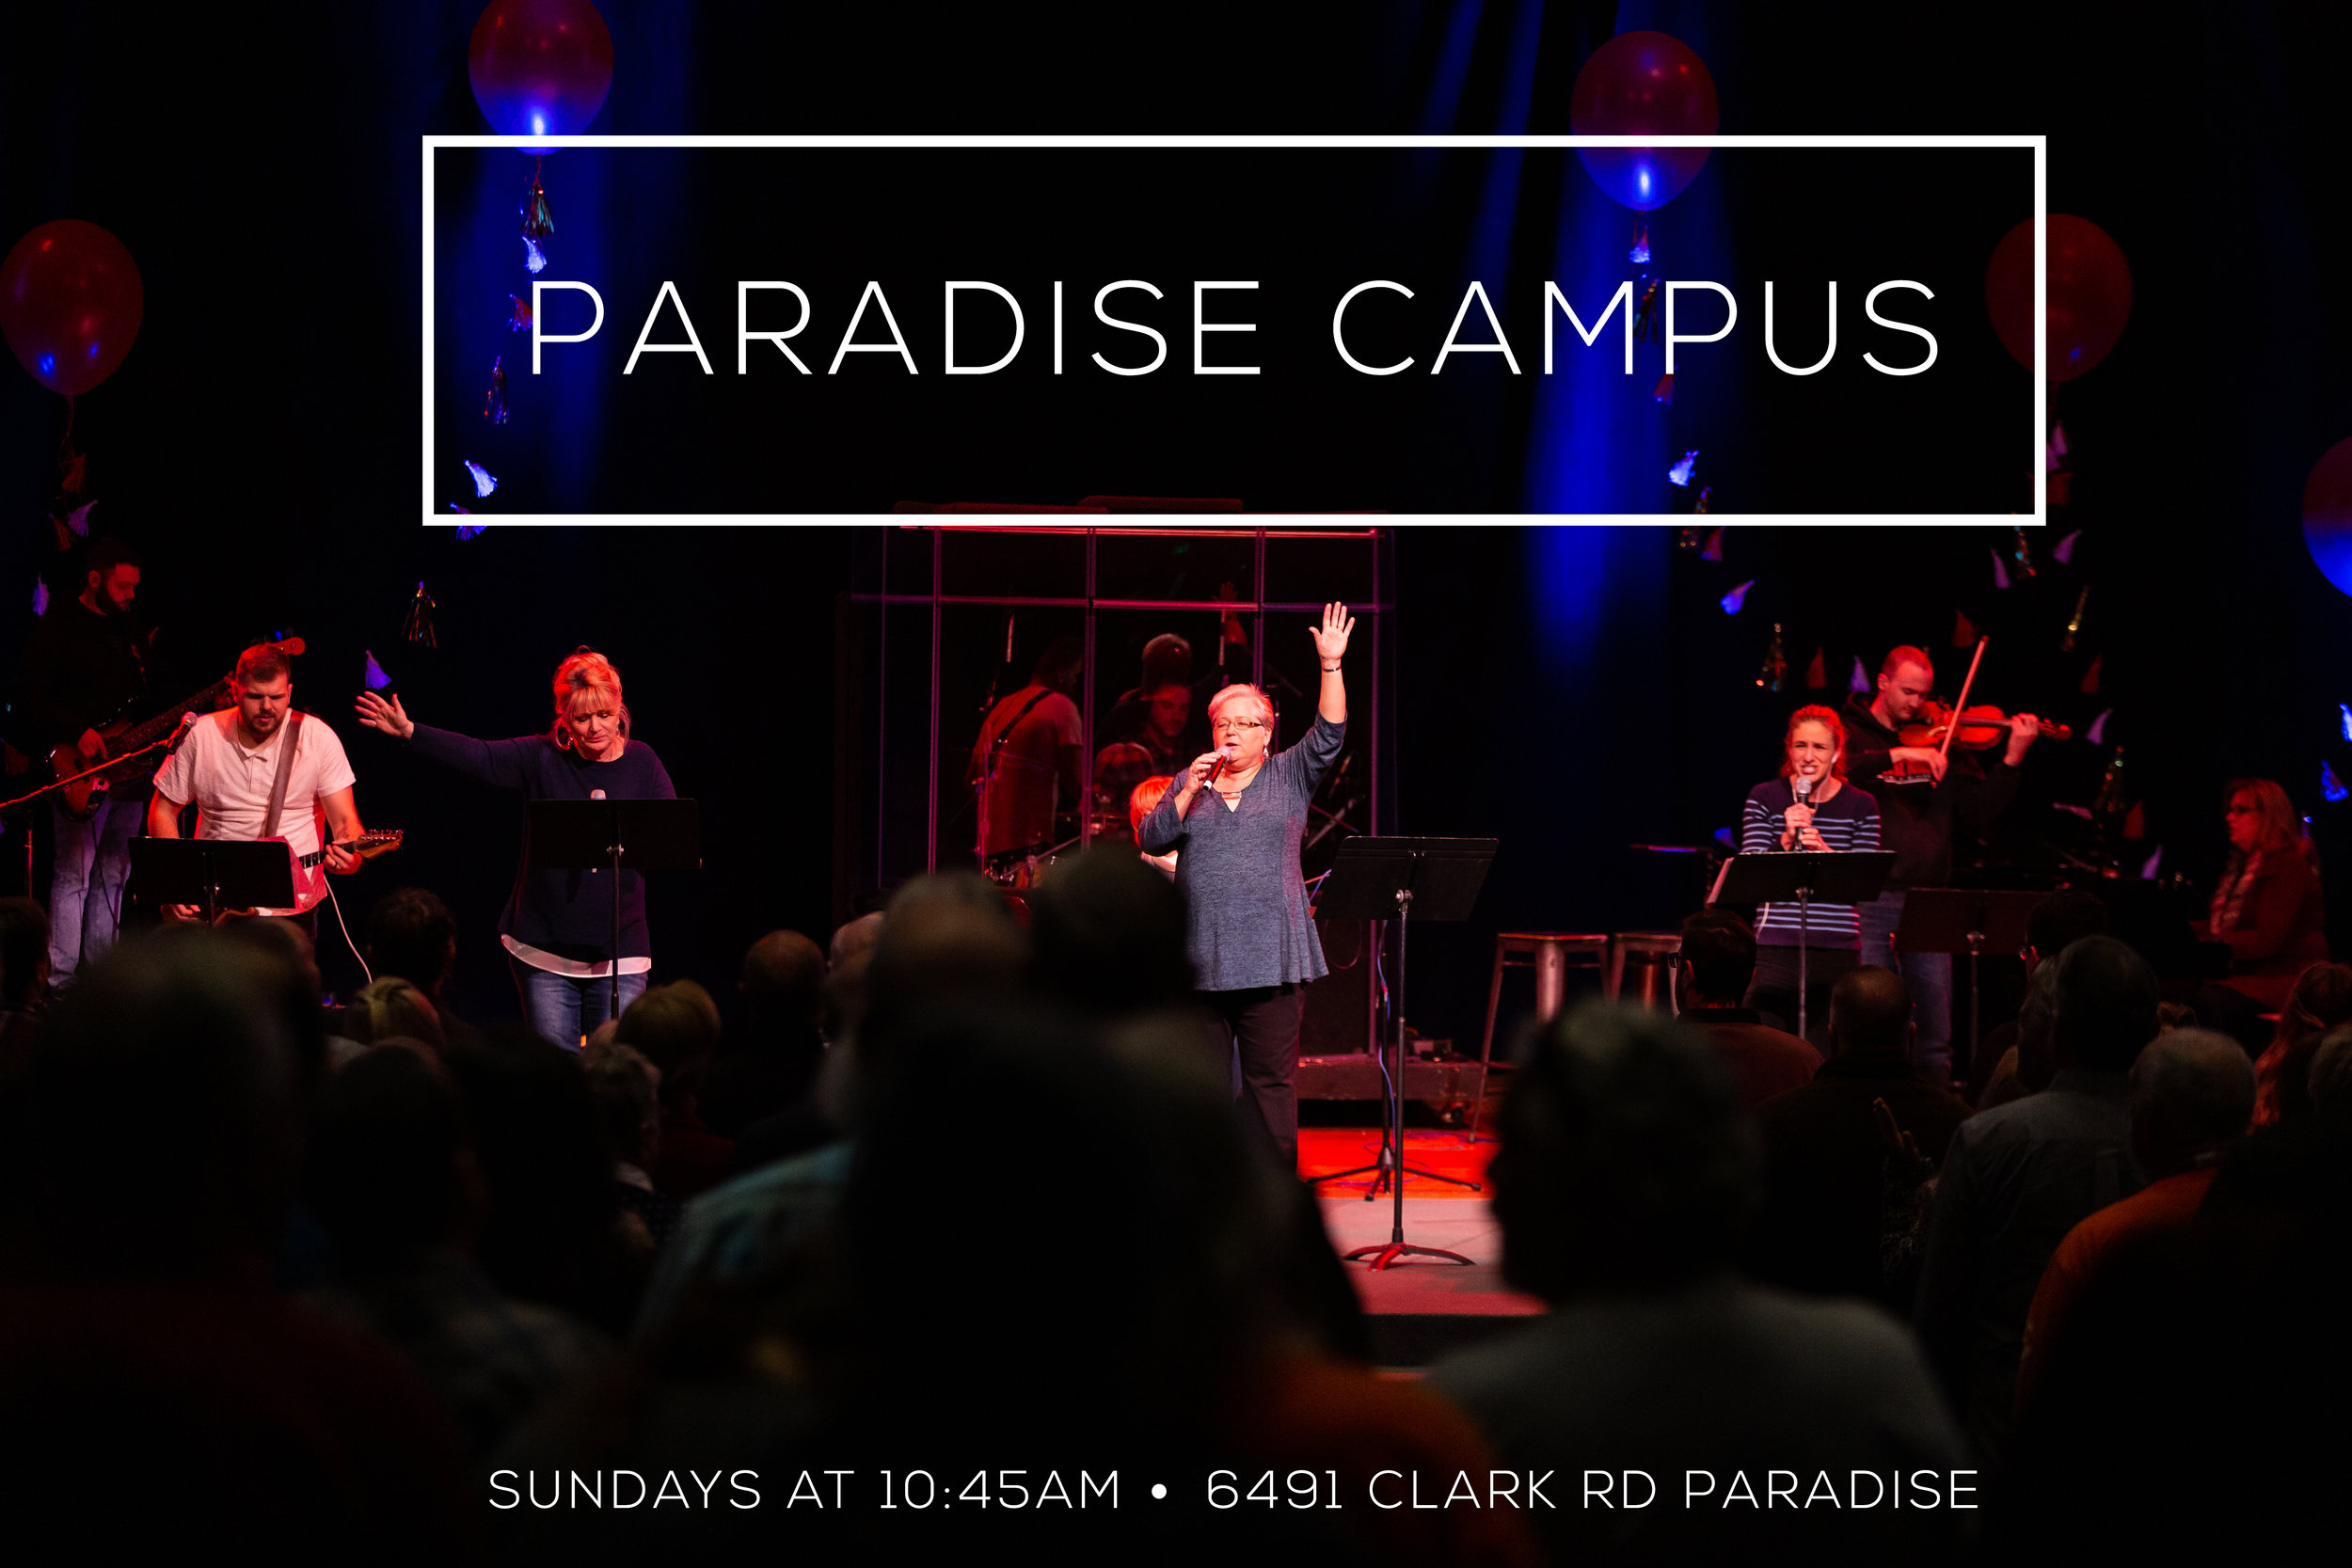 paradise page image.jpg